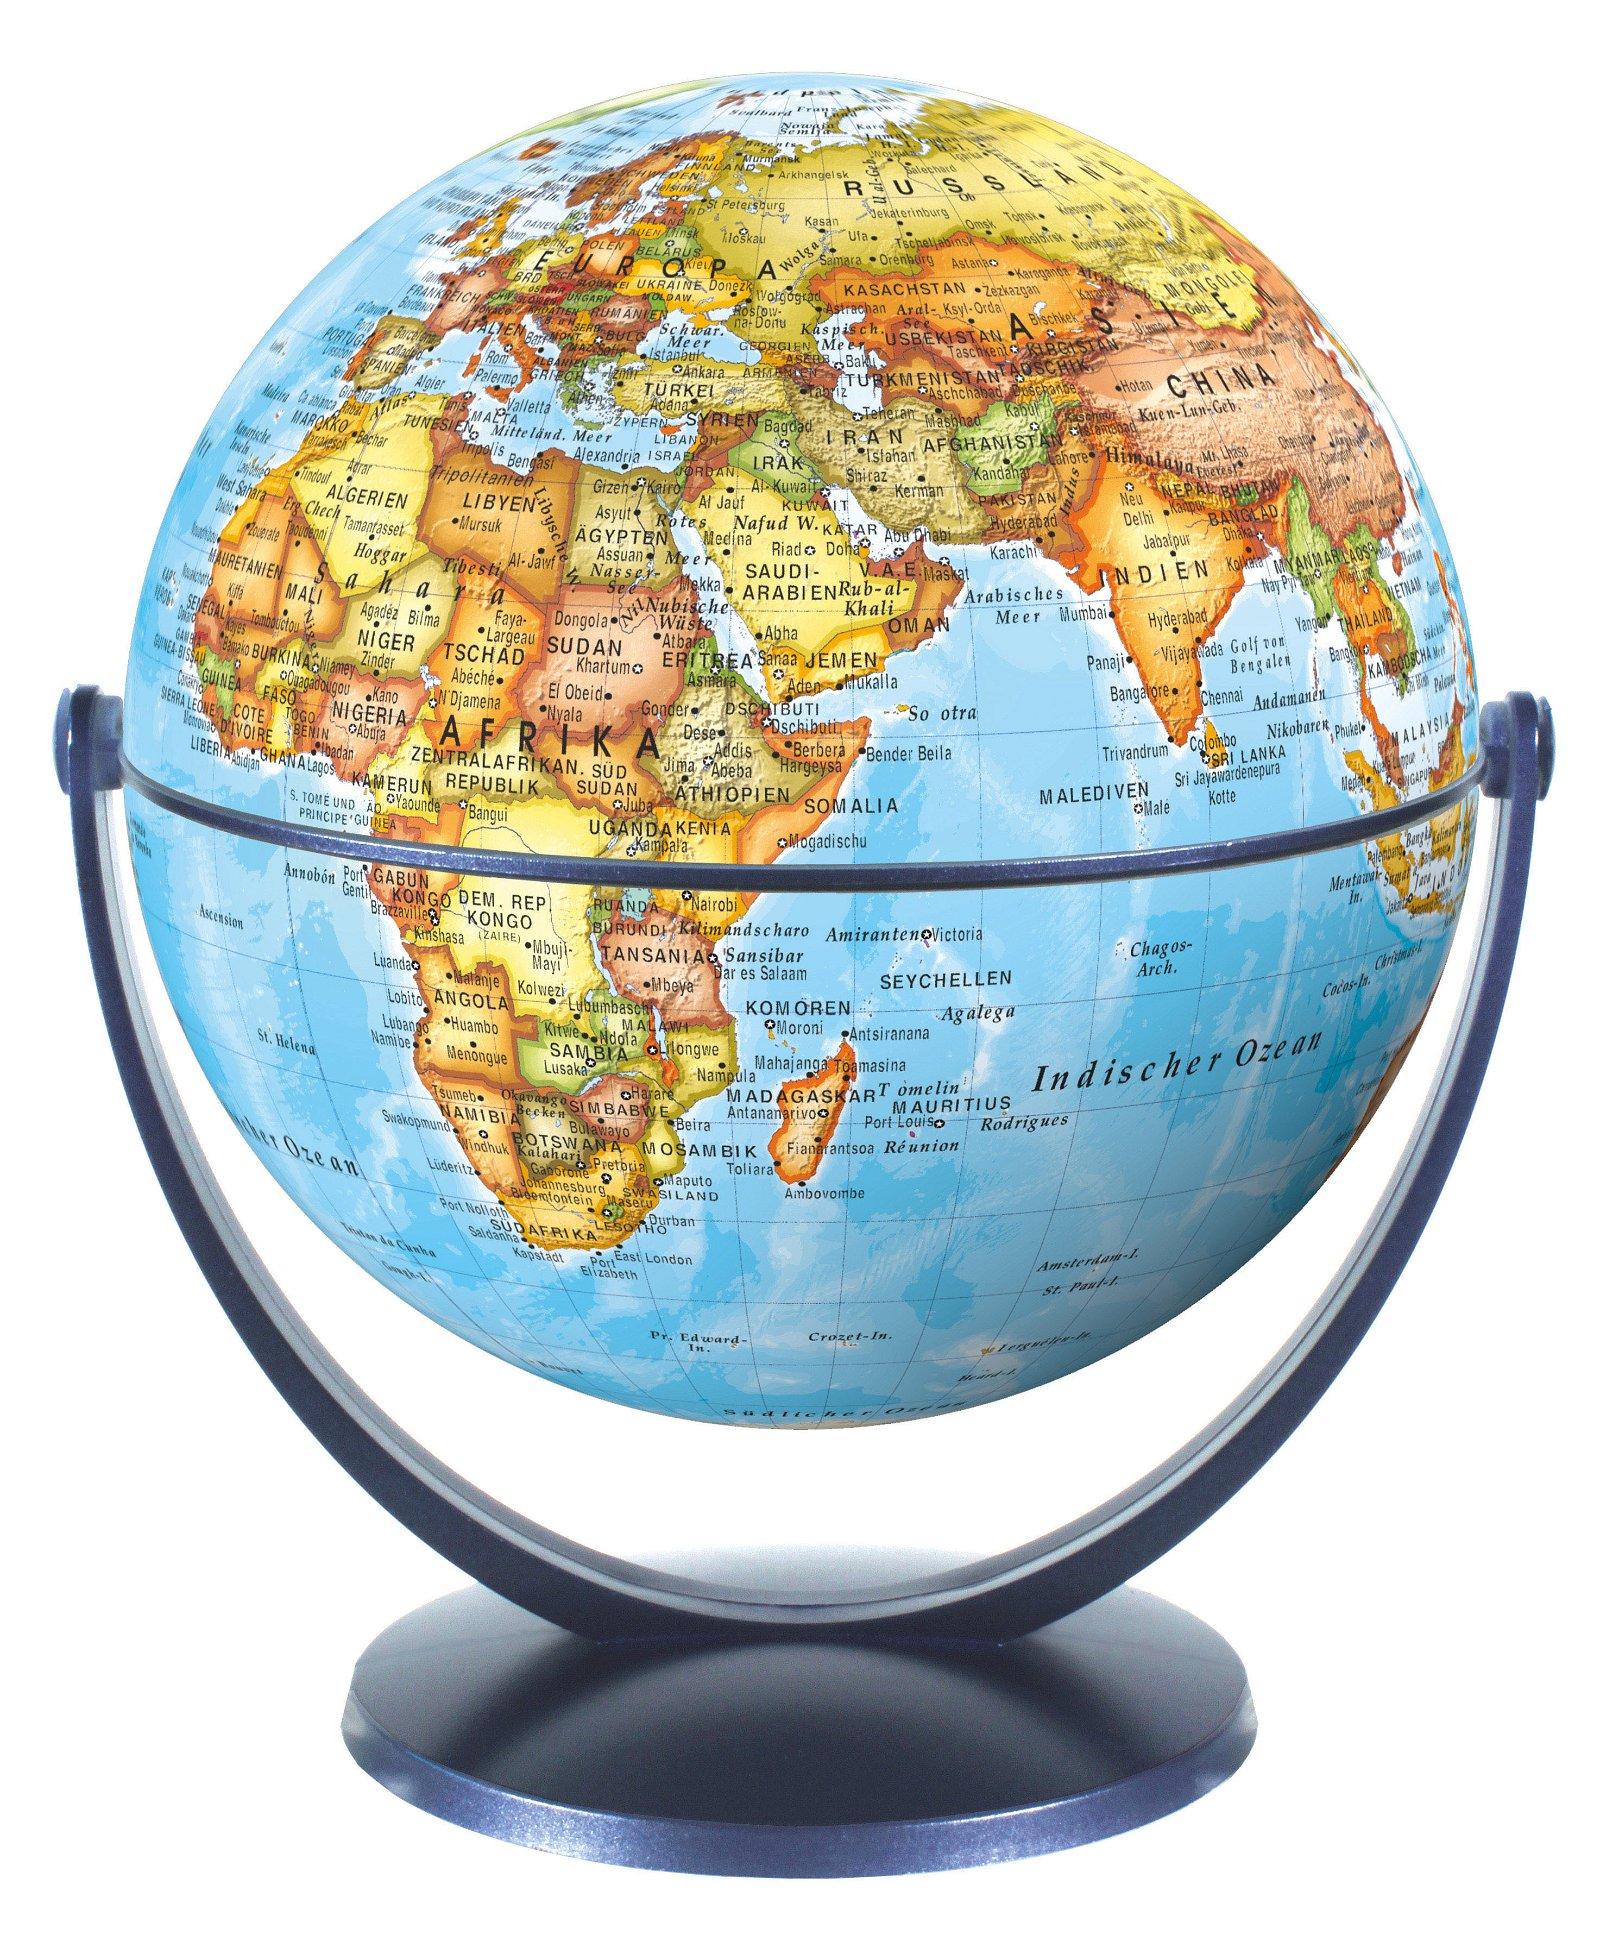 Draai & Kantelglobe 15 cm staatkundig 4028465940132  Stellanova Globes / Wereldbollen  Globes Wereld als geheel